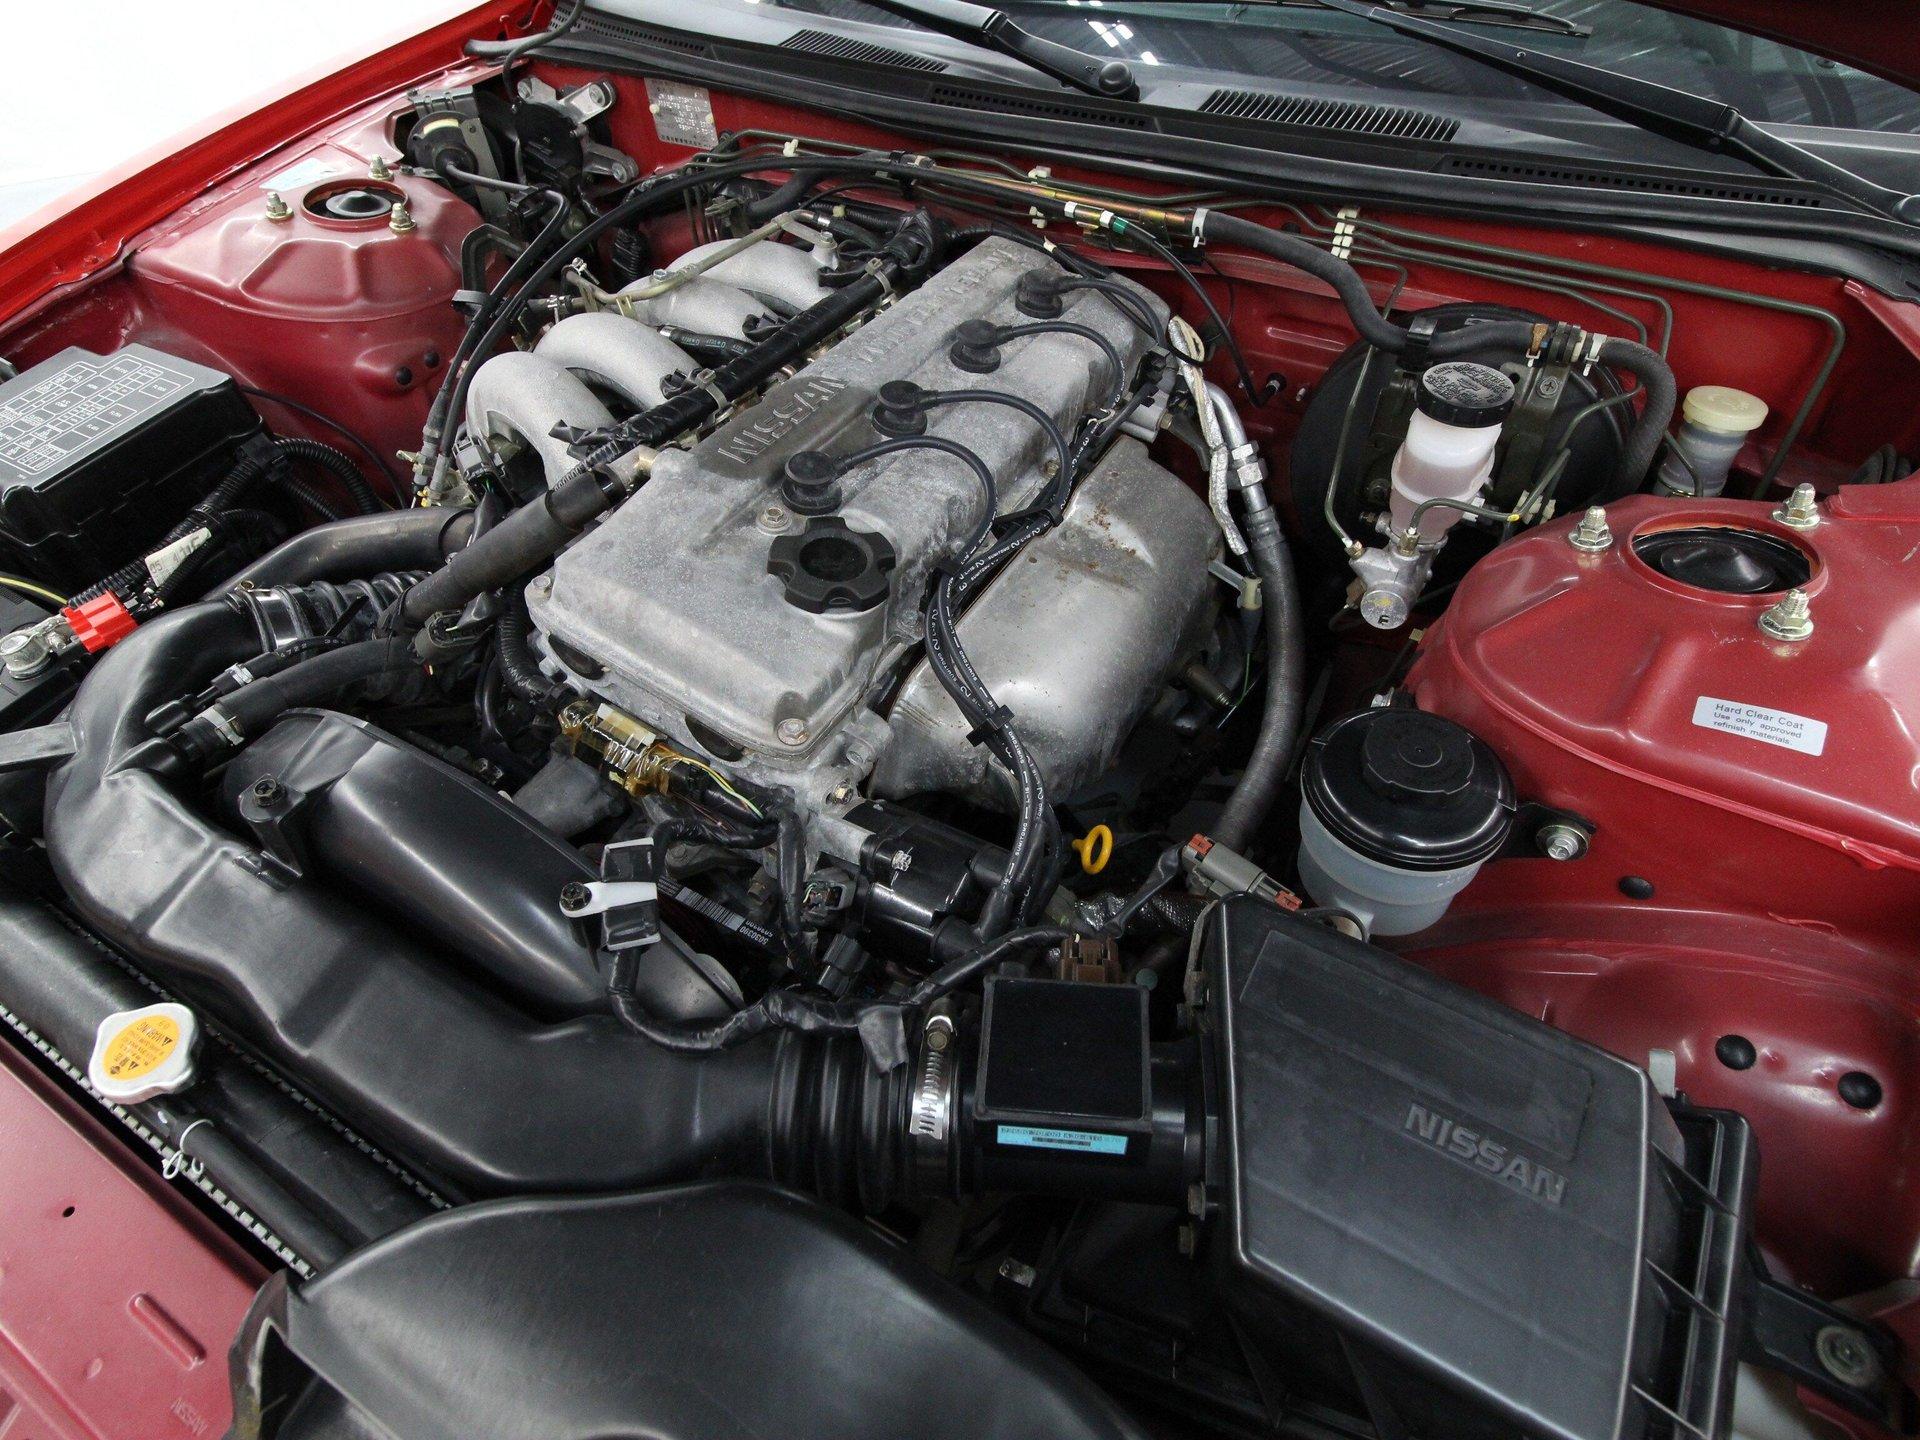 1995 Nissan 240SX